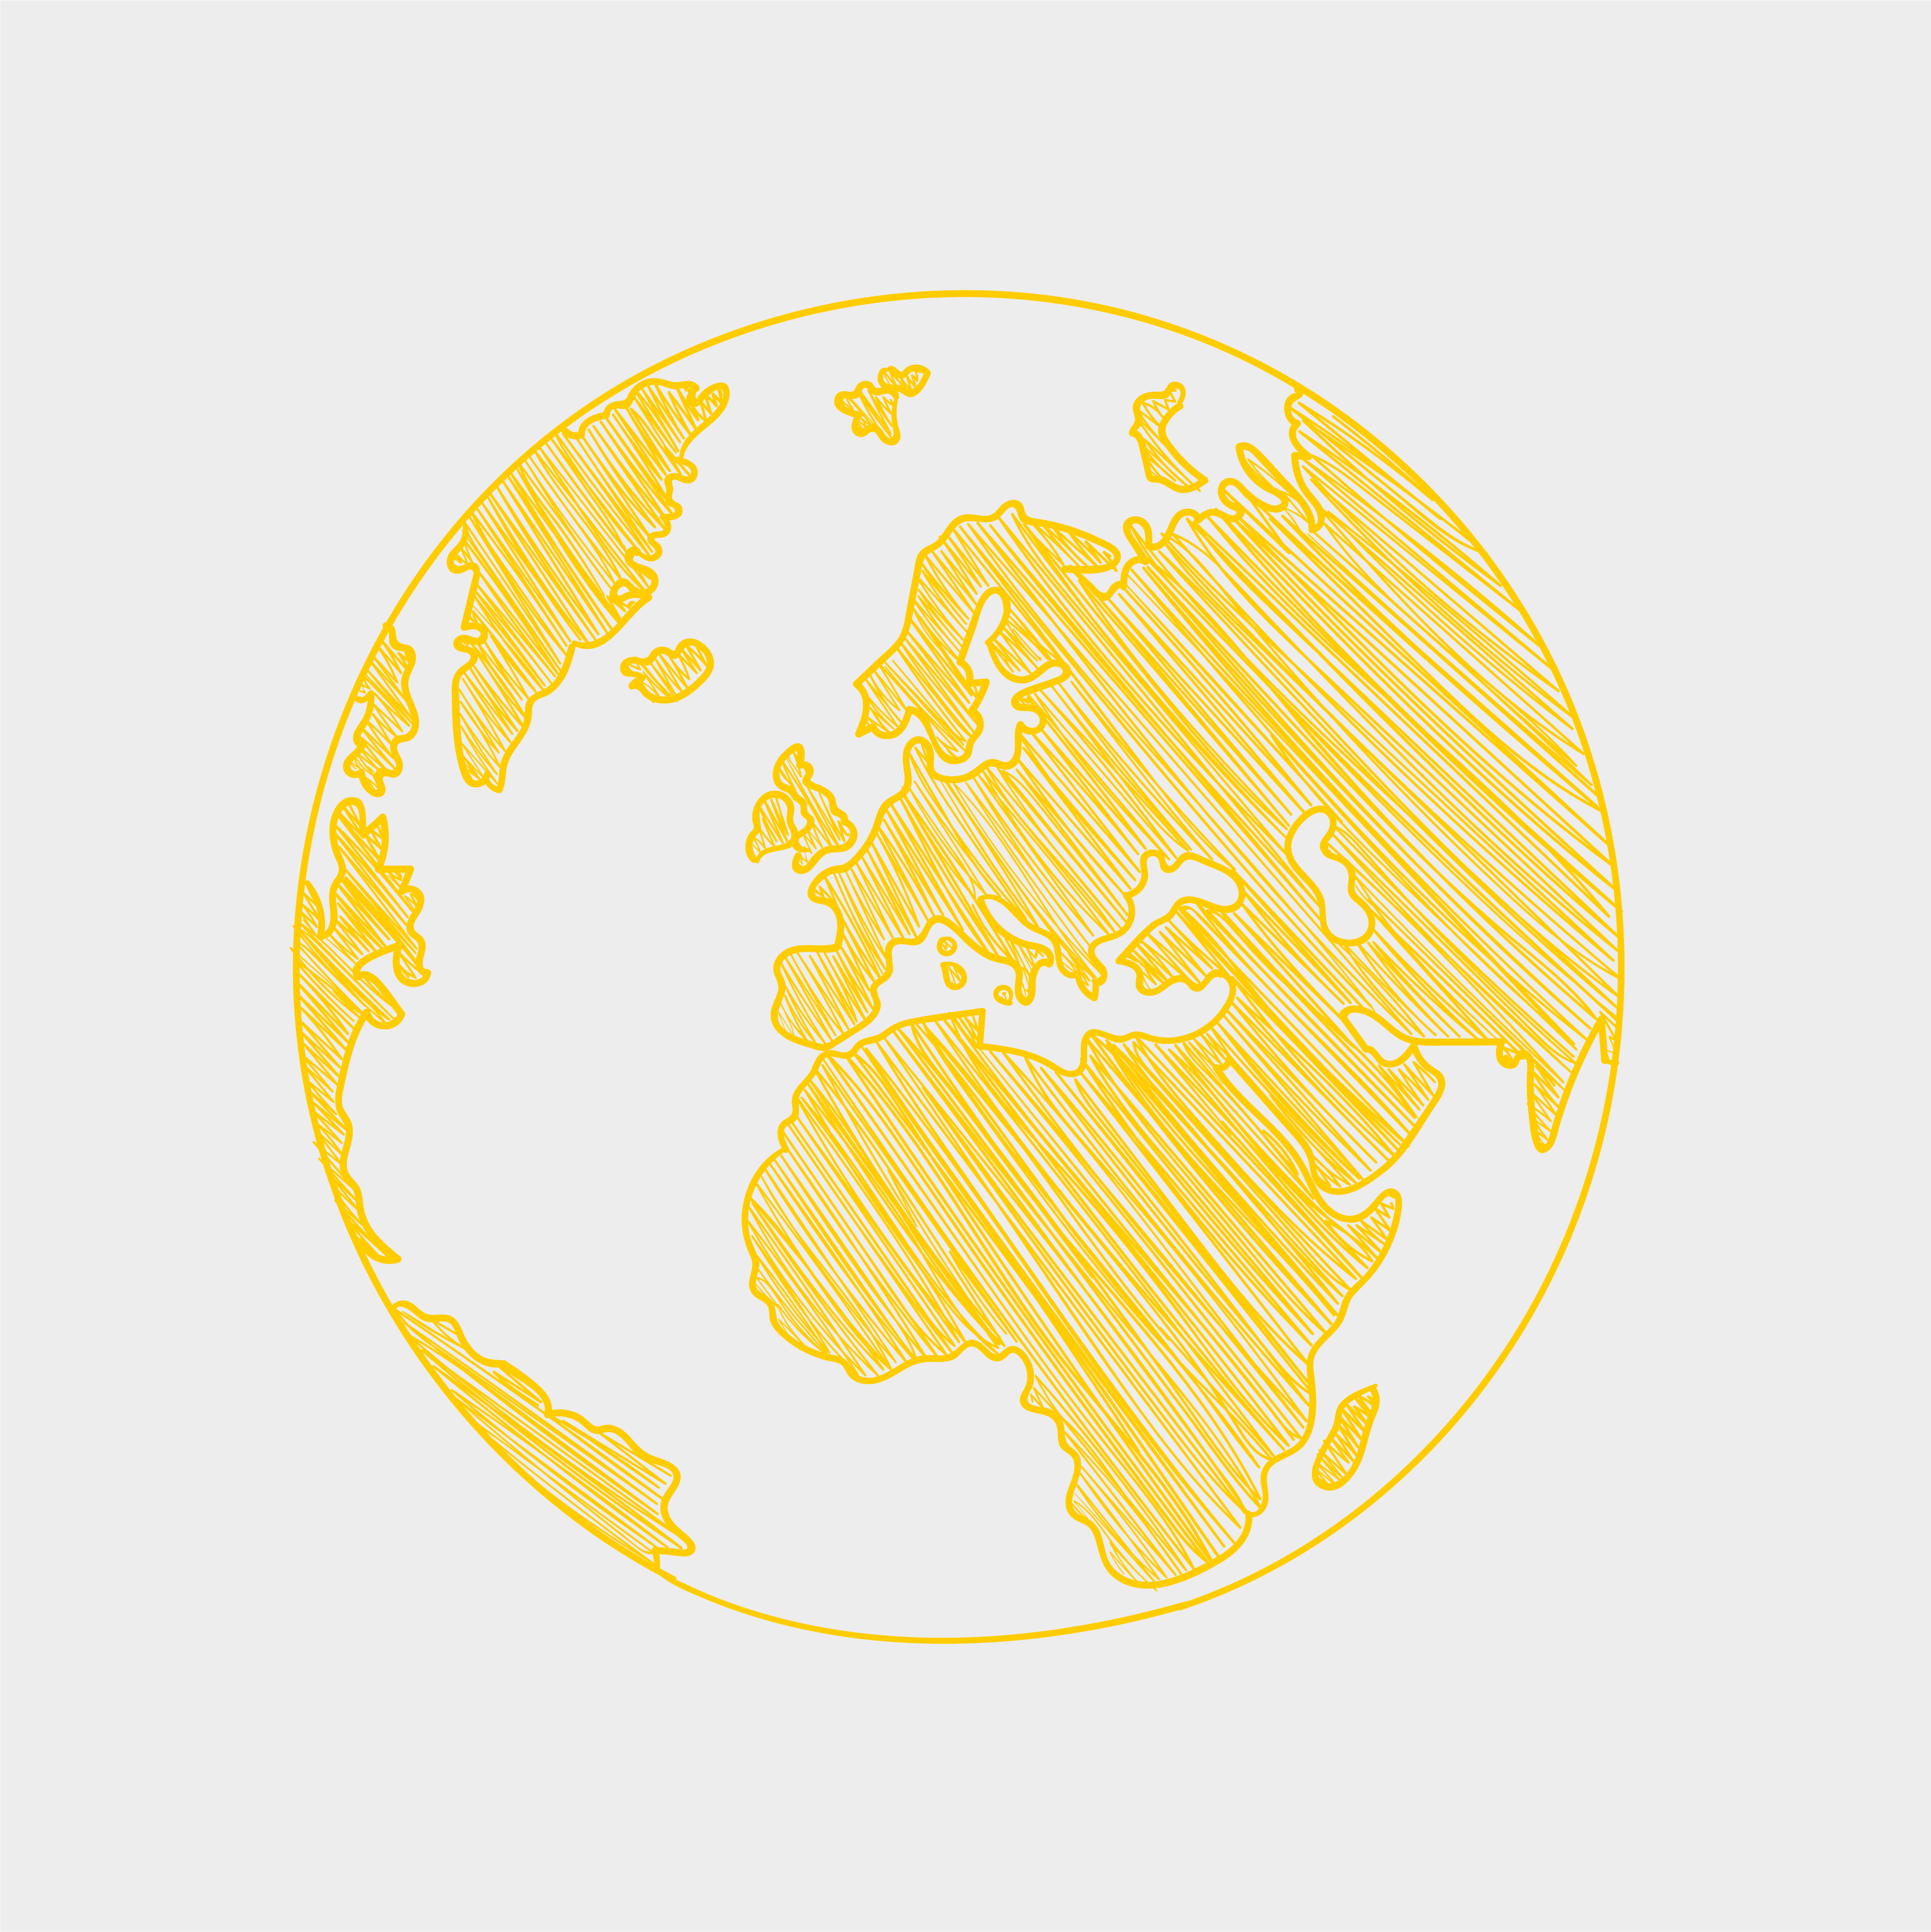 afp globe